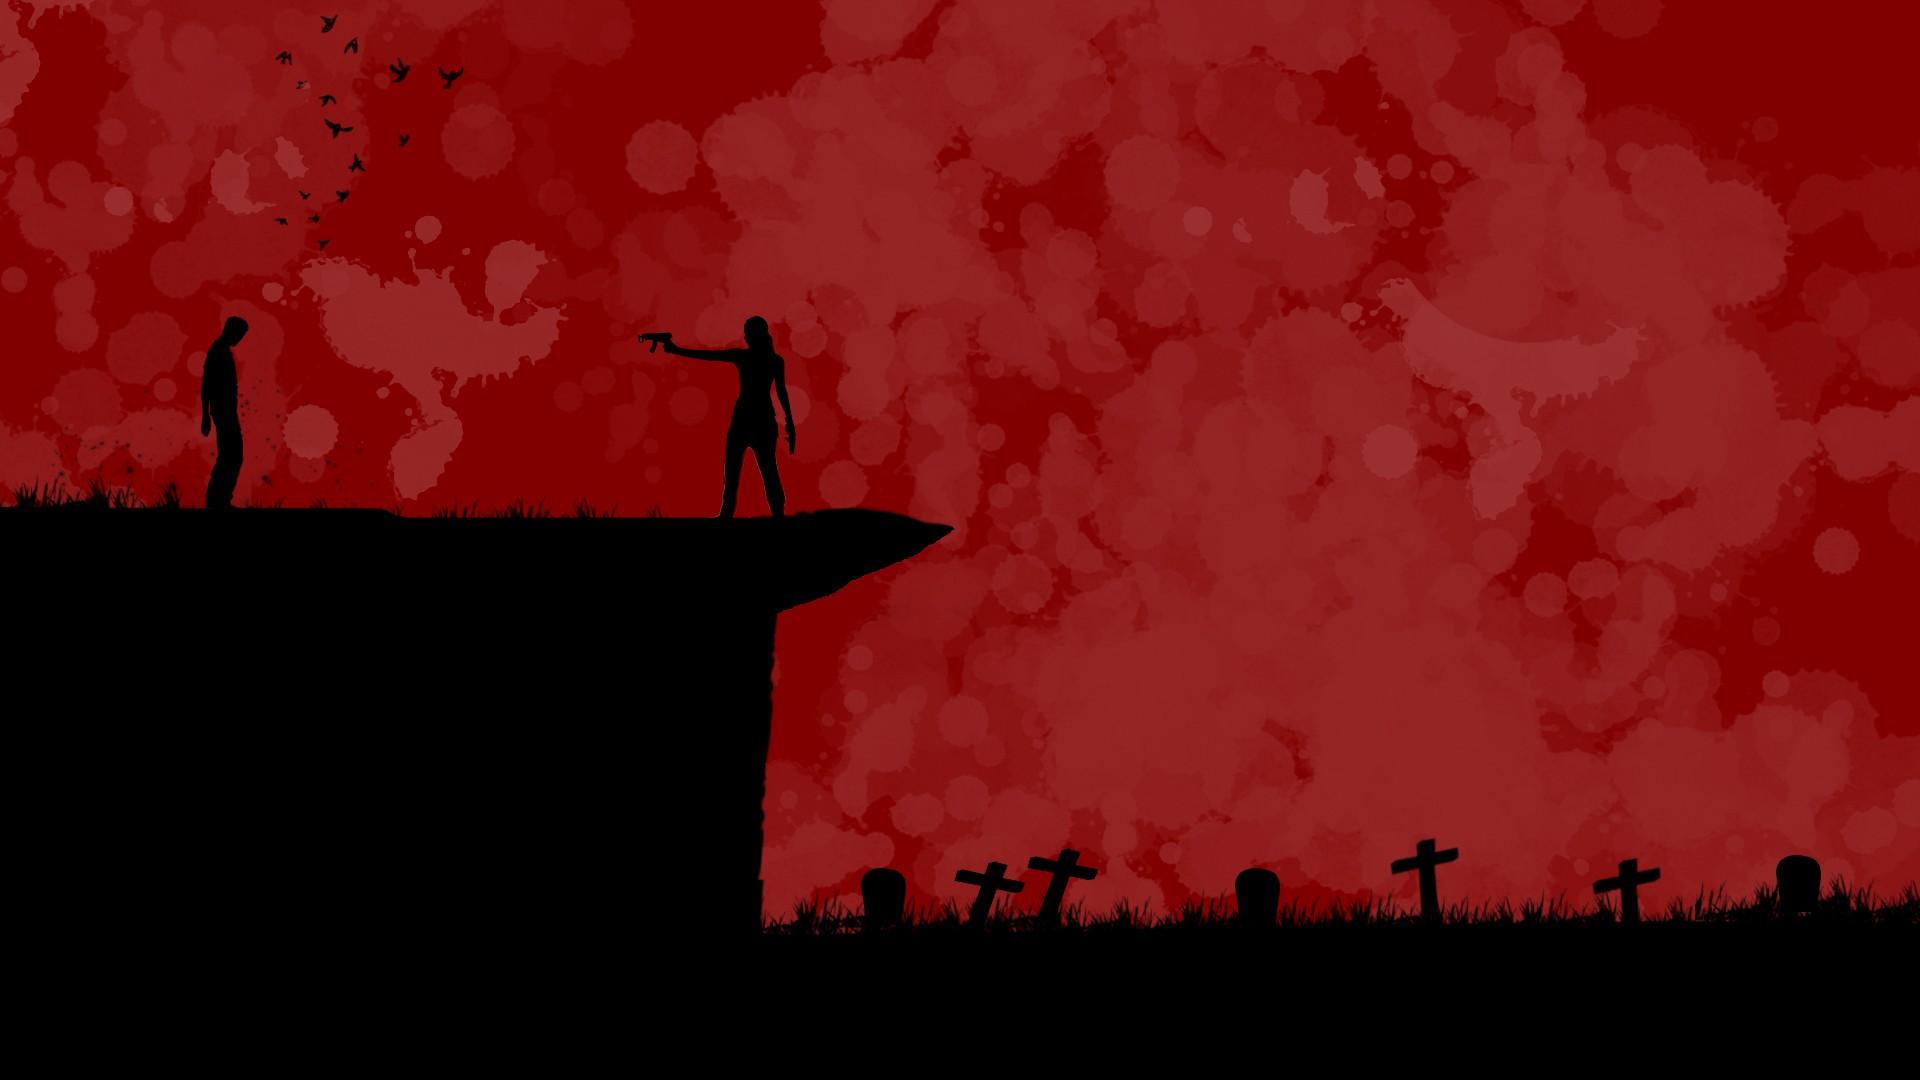 Cowboy Bebop Iphone X Wallpaper 33 Zombie Backgrounds 183 ① Download Free Beautiful High